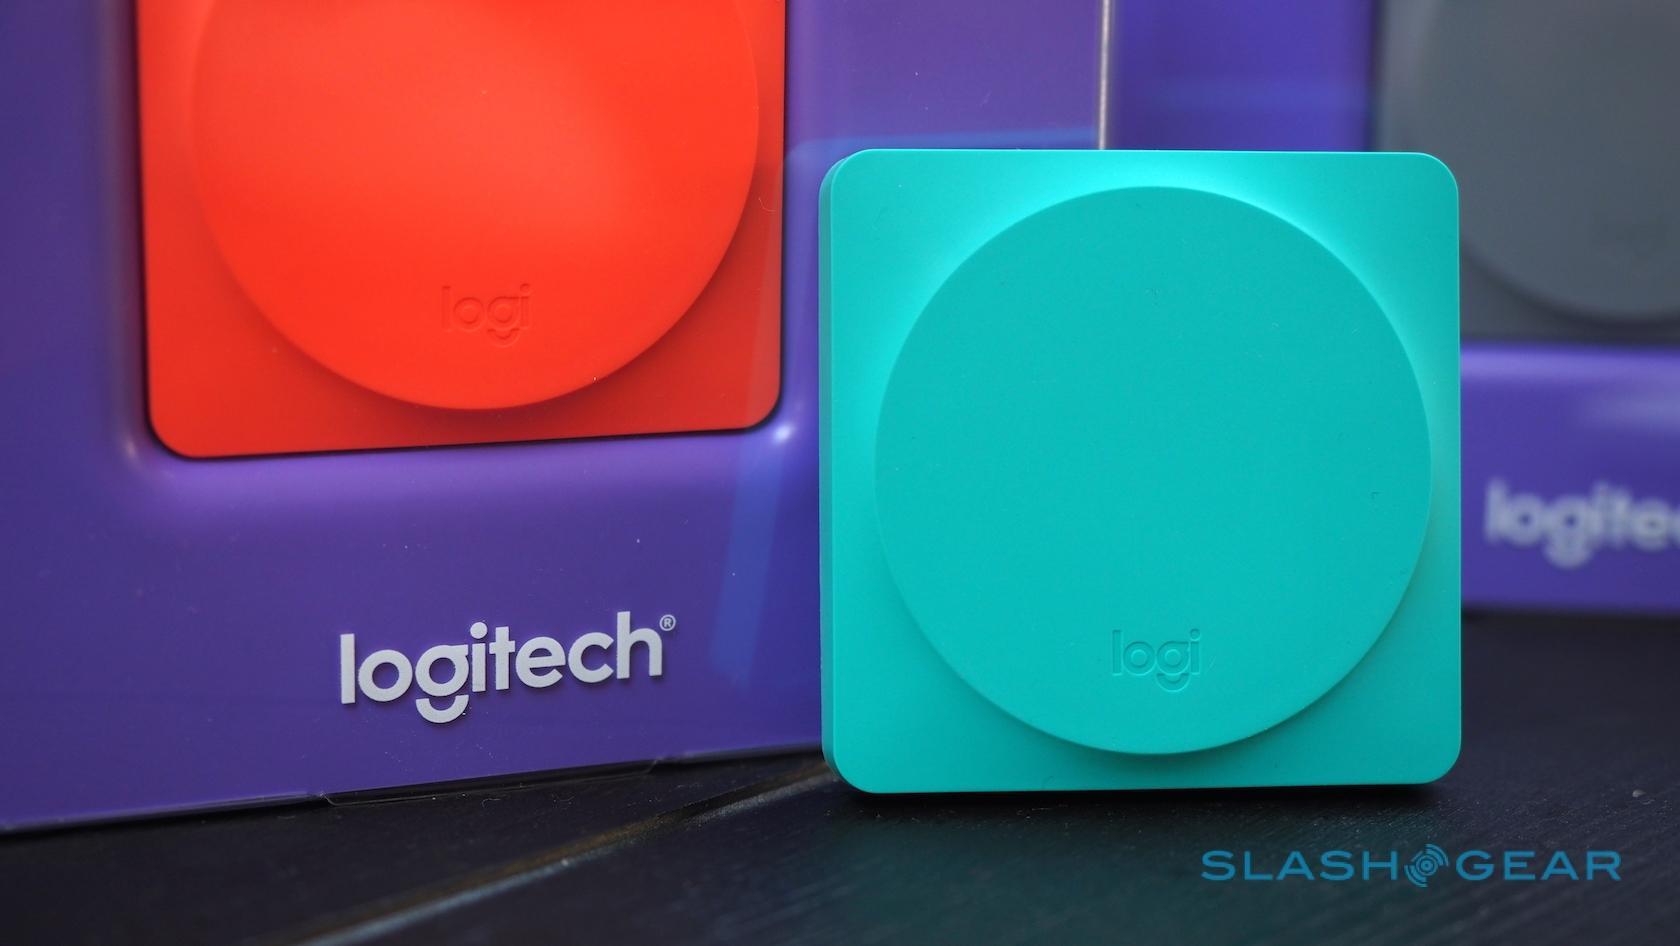 Logitech Pop Review: A smarter button for the IoT - SlashGear